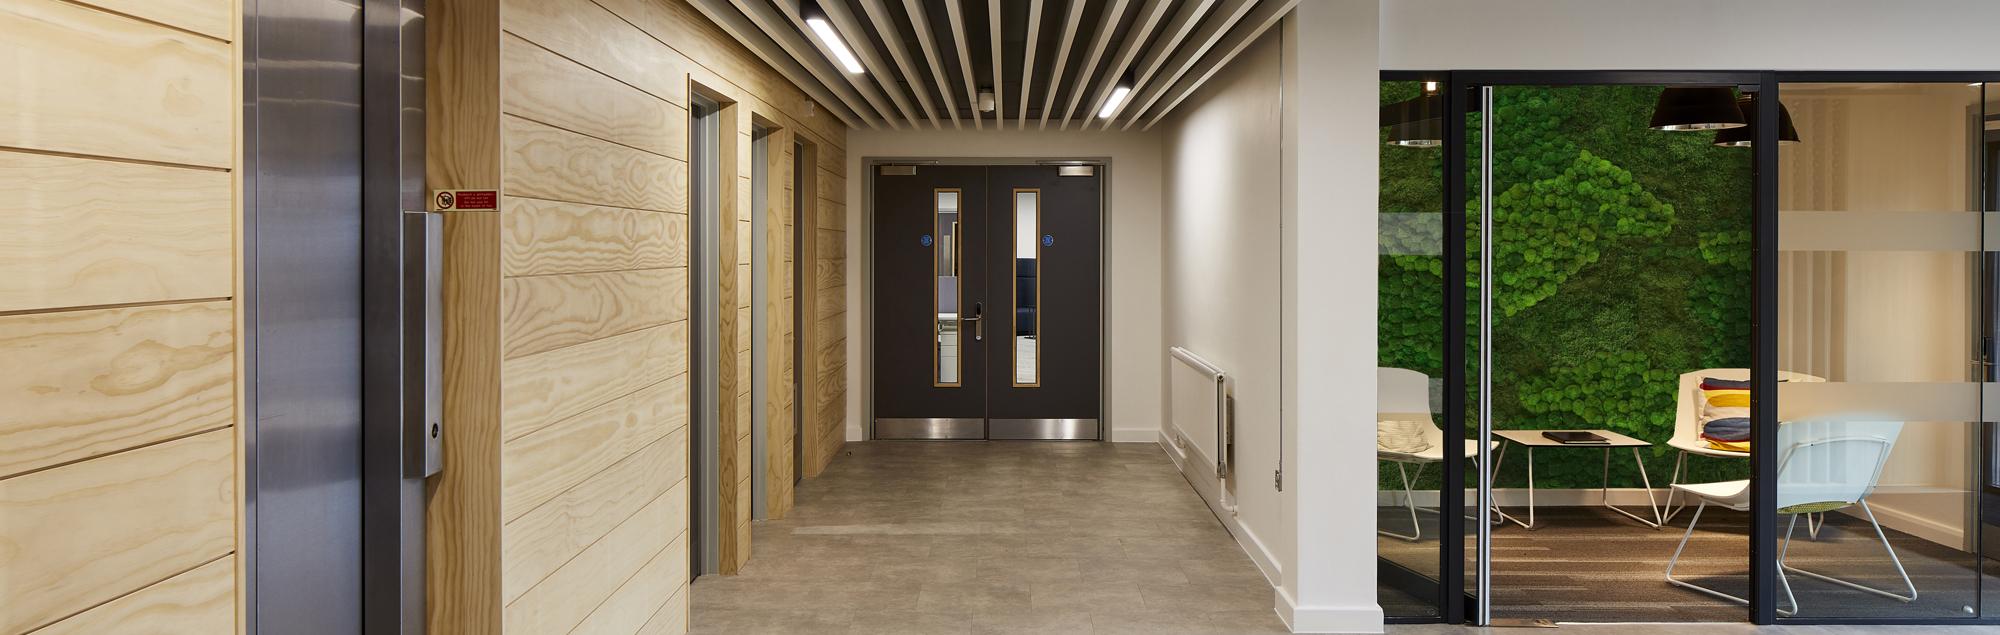 Cardiff Metropolitan University Alexander House Refurbishment